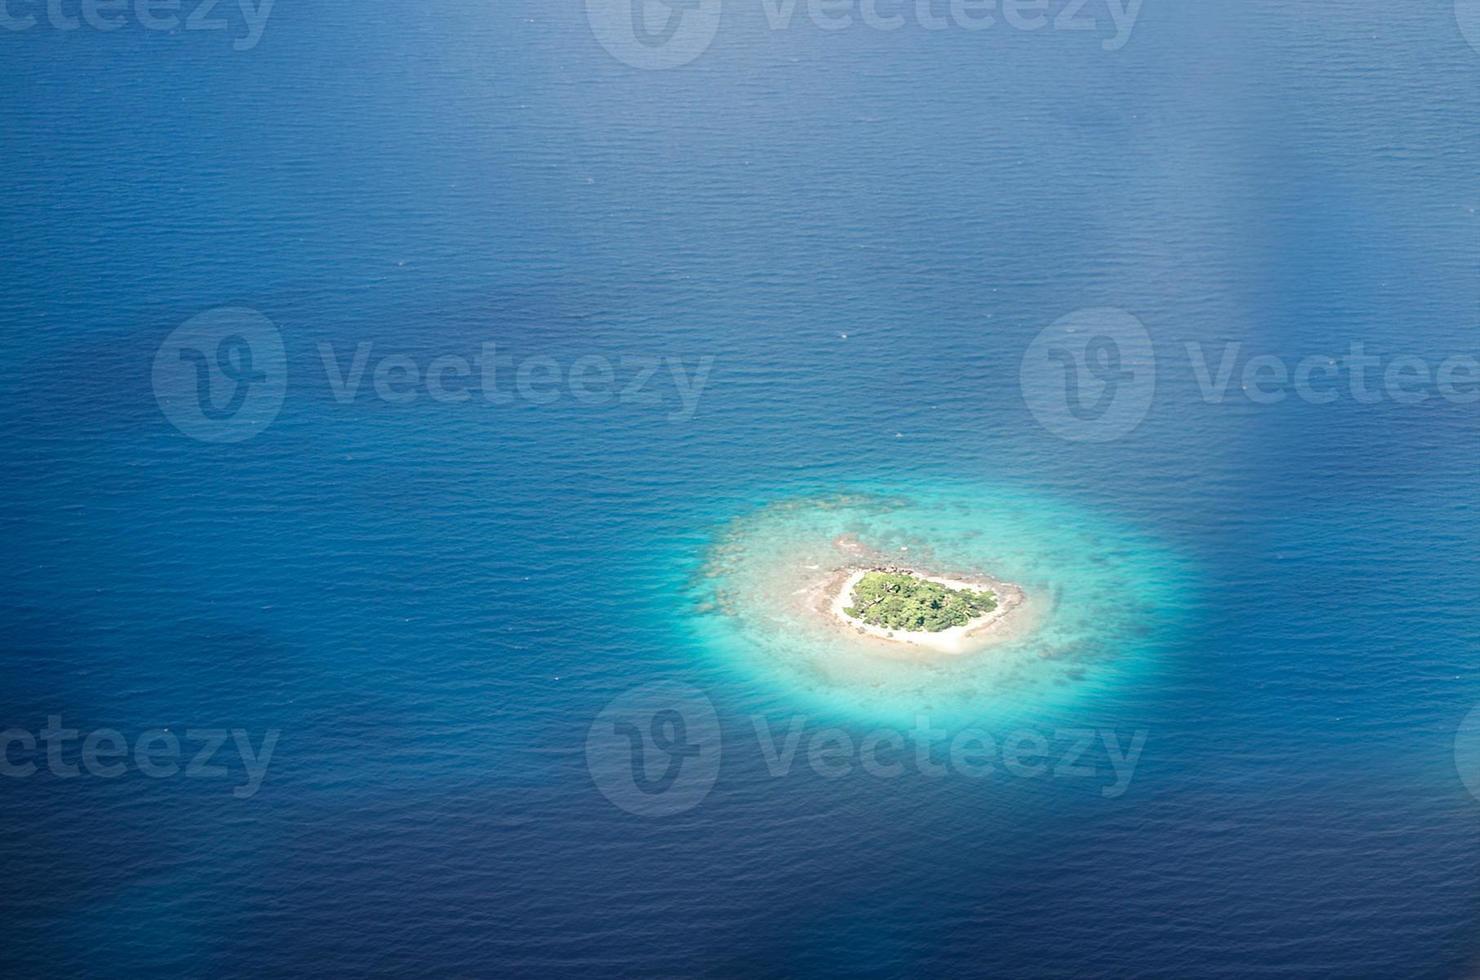 ilha desabitada no Pacífico foto